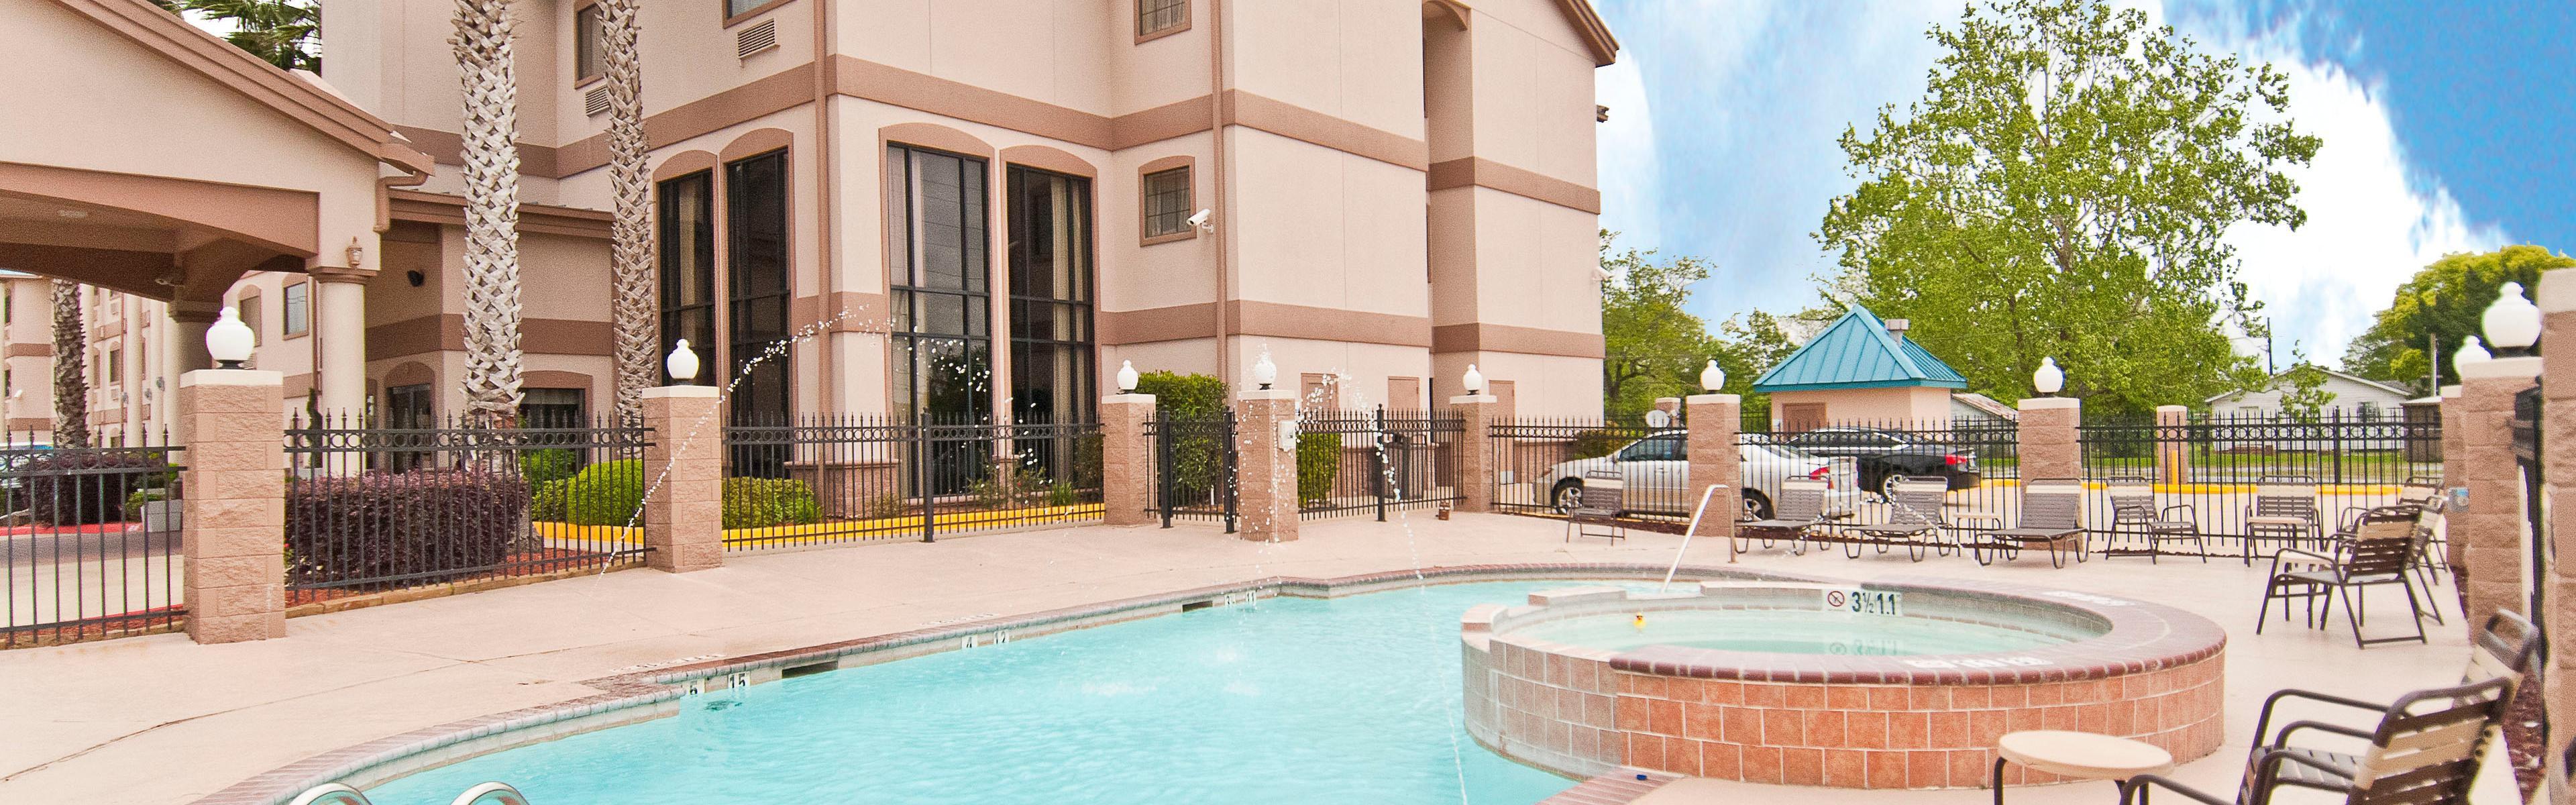 Holiday Inn Express & Suites Lake Charles image 2